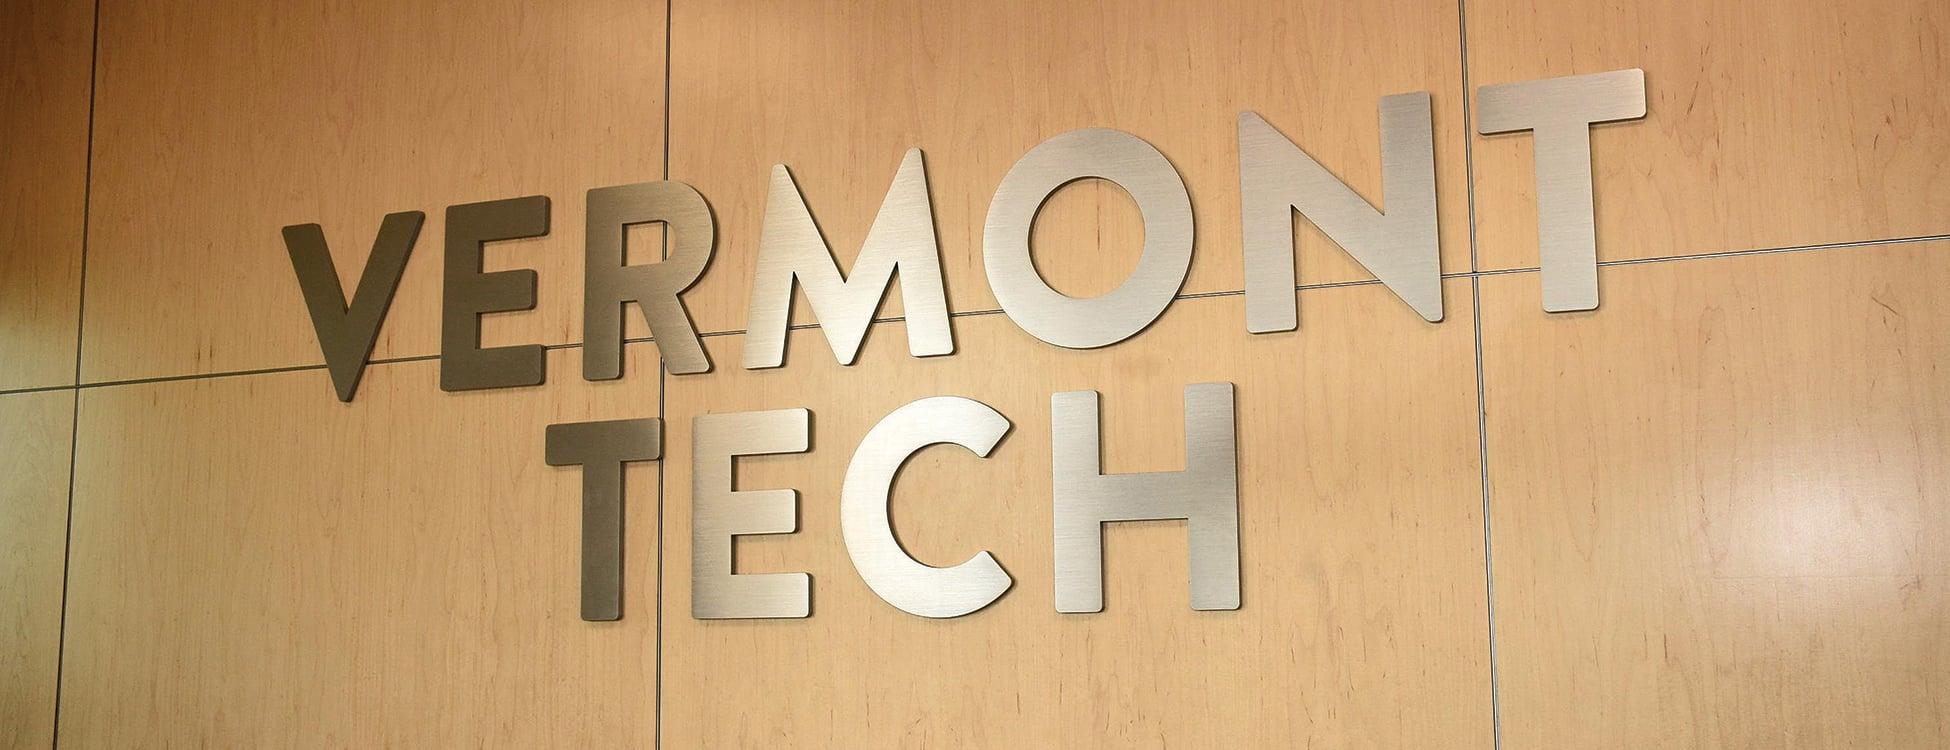 Vermont Tech Logo, wood, metal